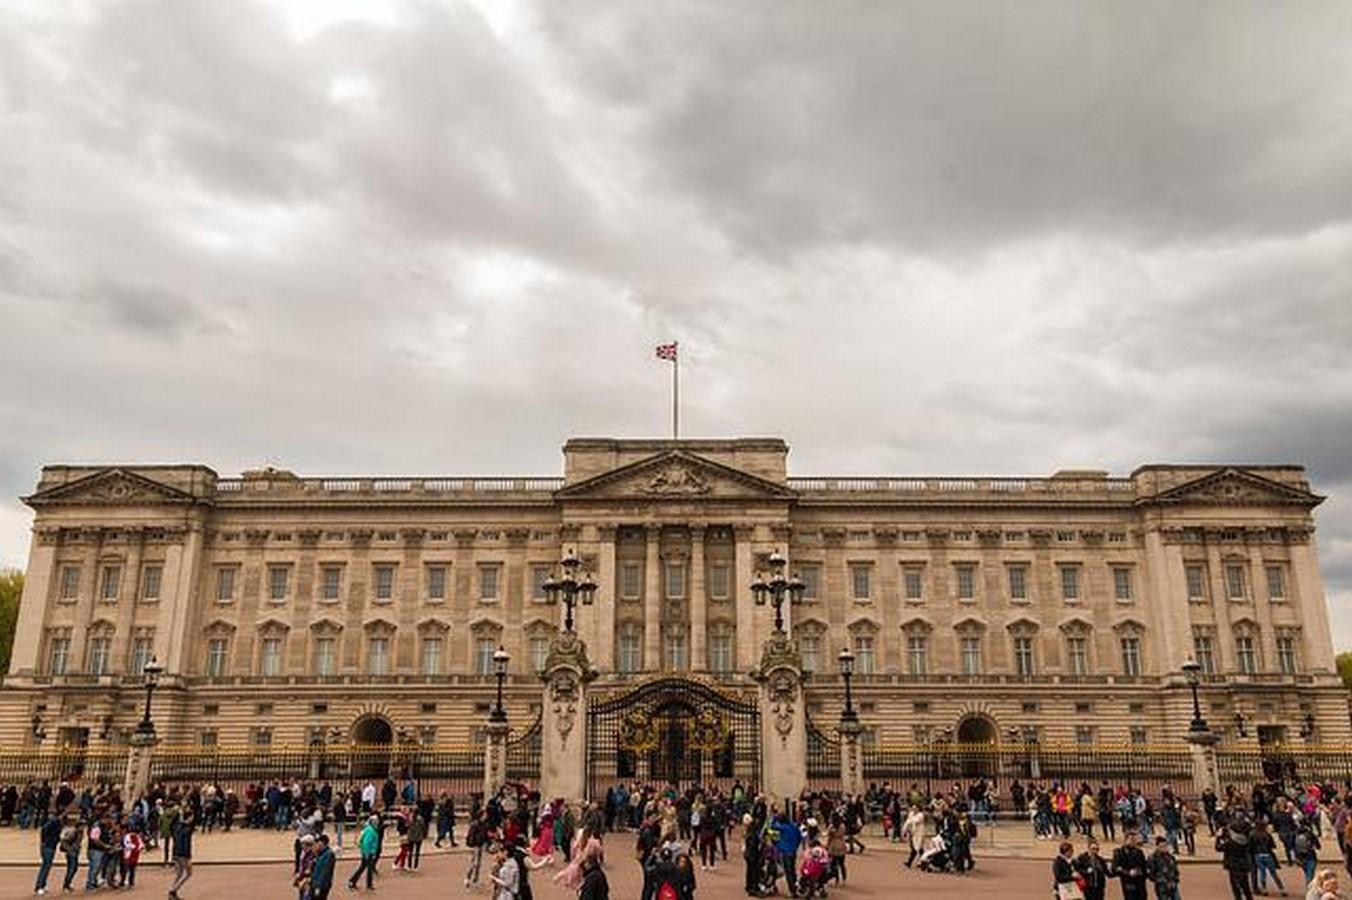 Buckingham palace - Sheet1